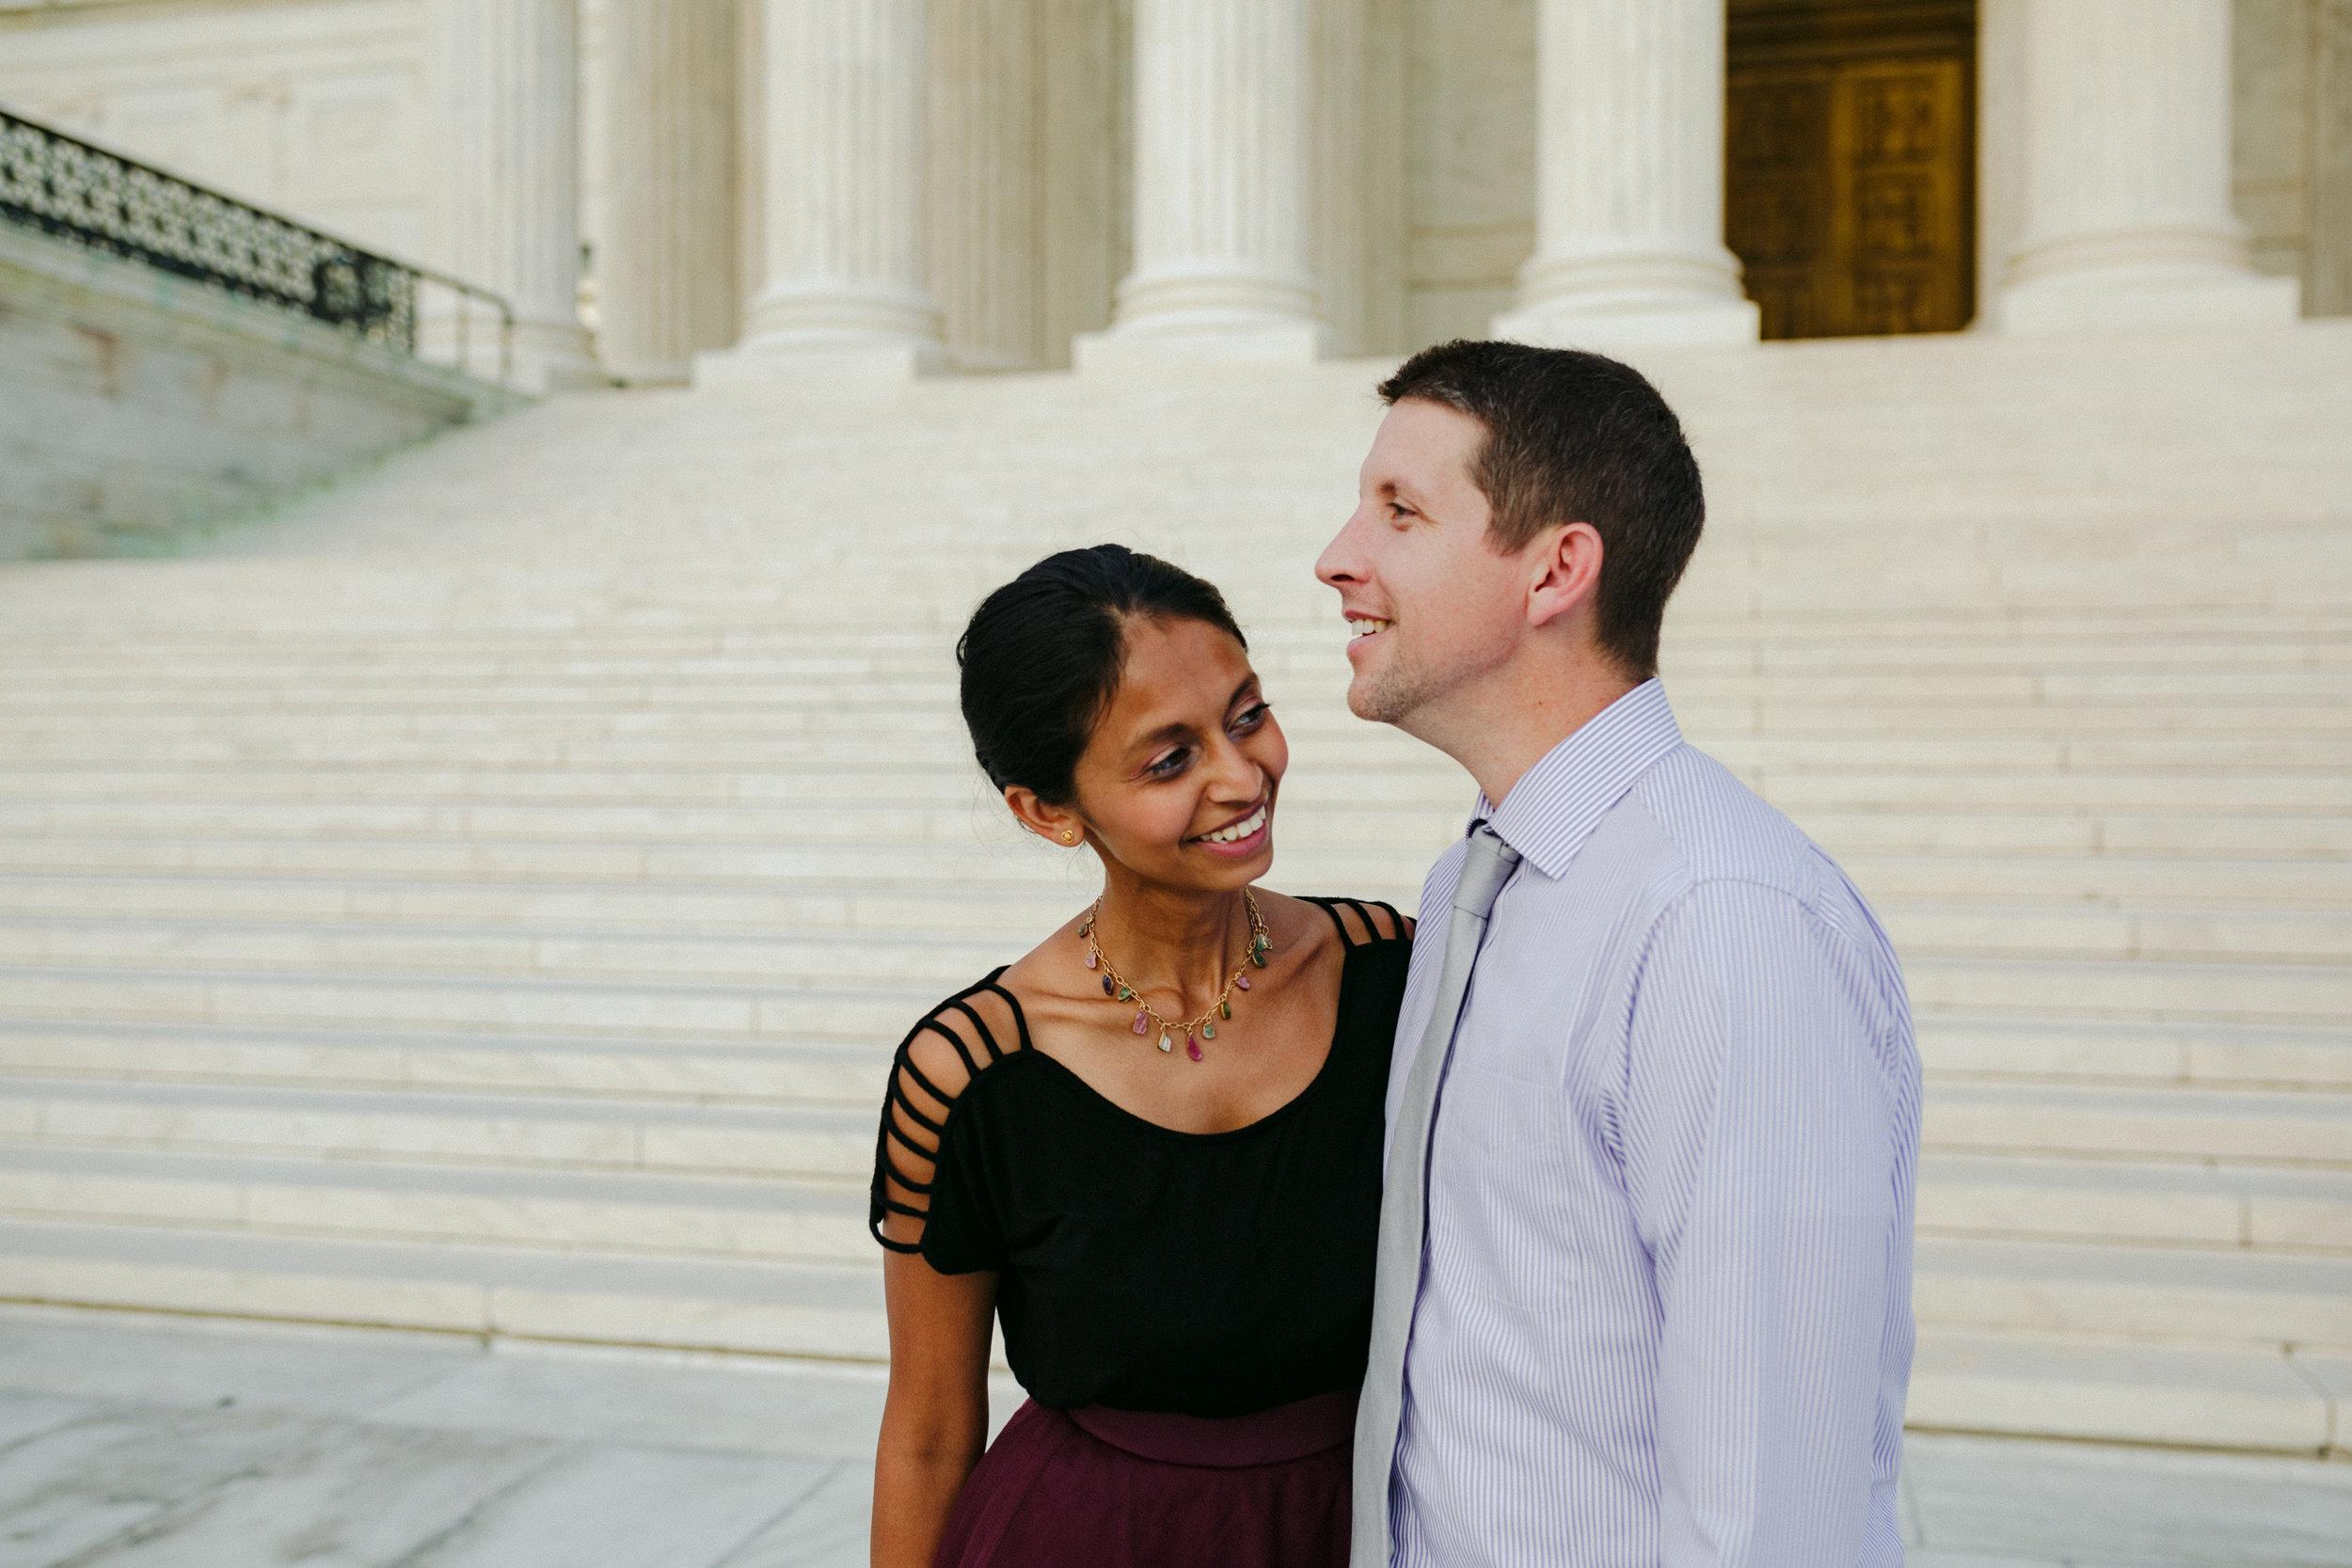 Craig + Davina - Washington D.C.